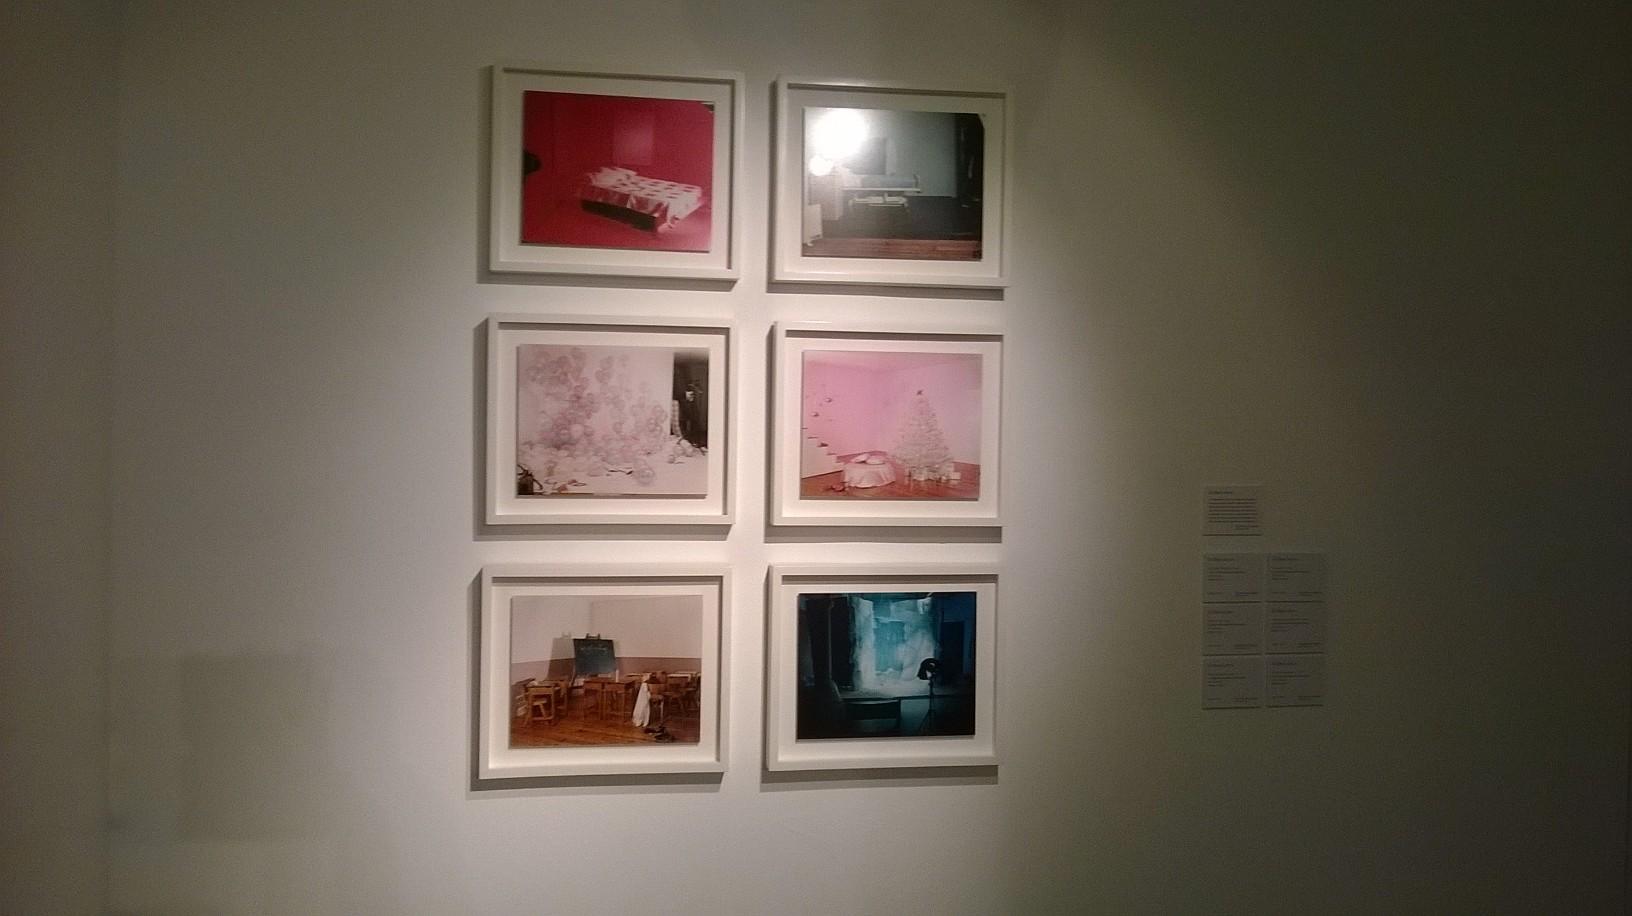 Jo Broughton, 2002-07, Empty Porn Sets, C-type prints mounted on aluminium